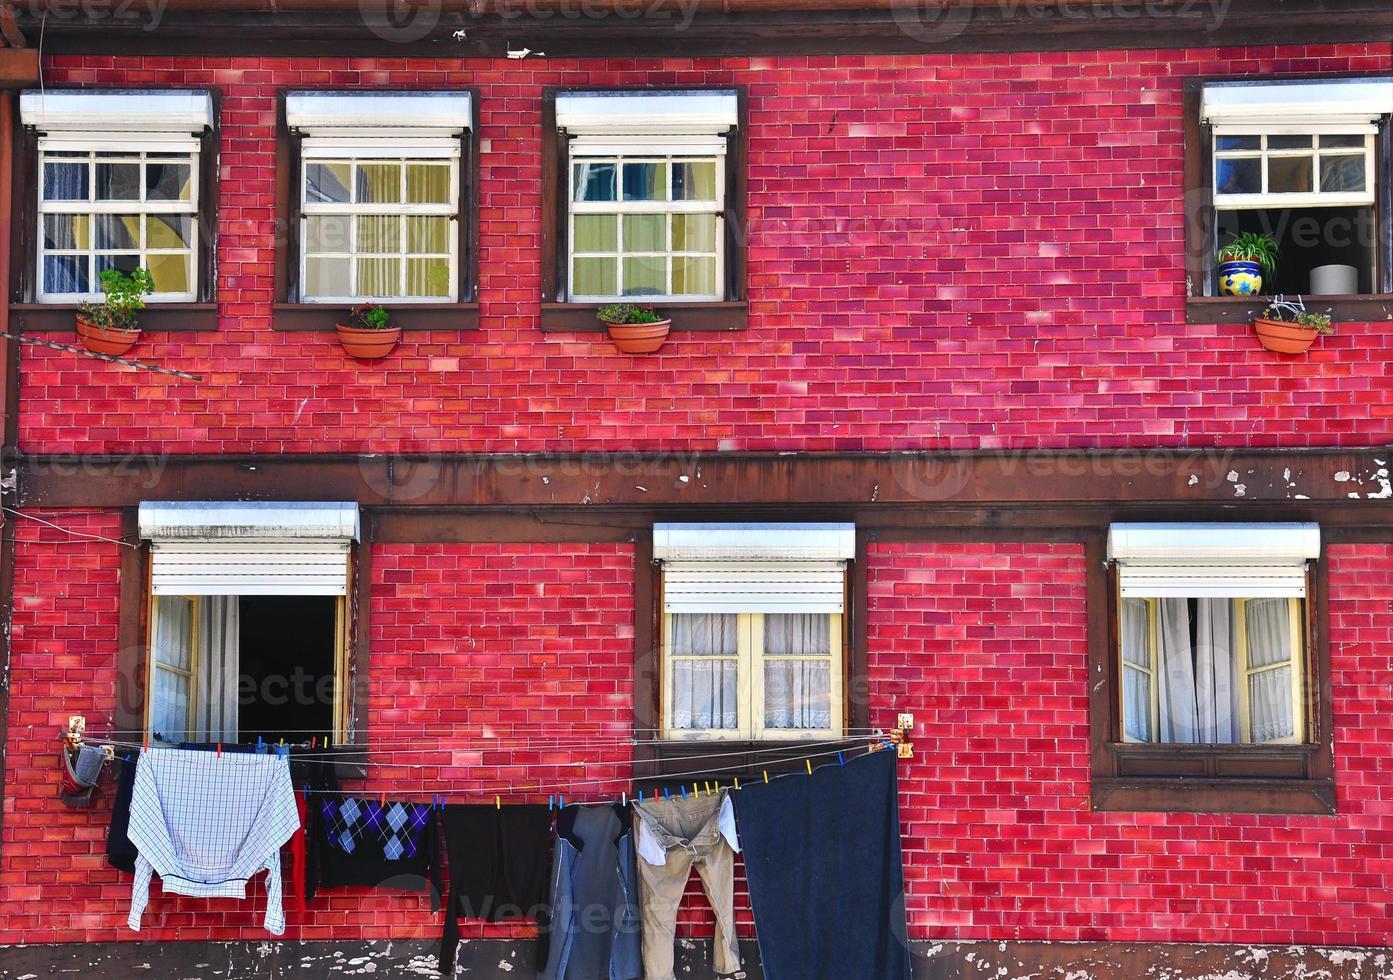 casa antiga colorida com paredes de azulejos foto